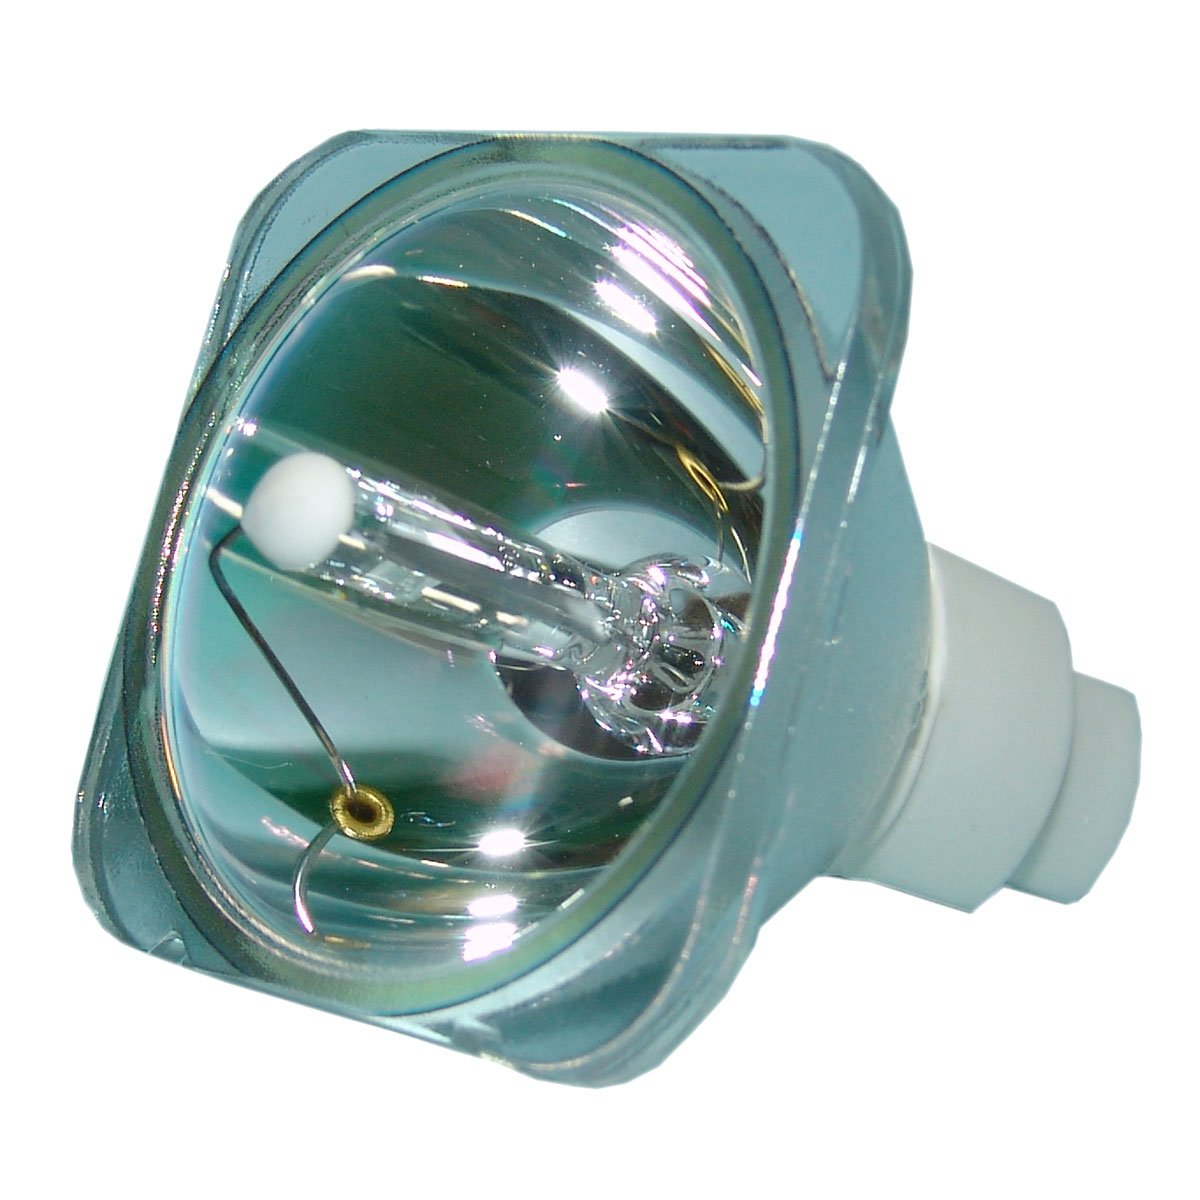 Lutema OEM 交換用ランプ ハウジング/電球付き Boxlight CD737X-930用 Economy Economy Lamp Only B07KTLKGTJ